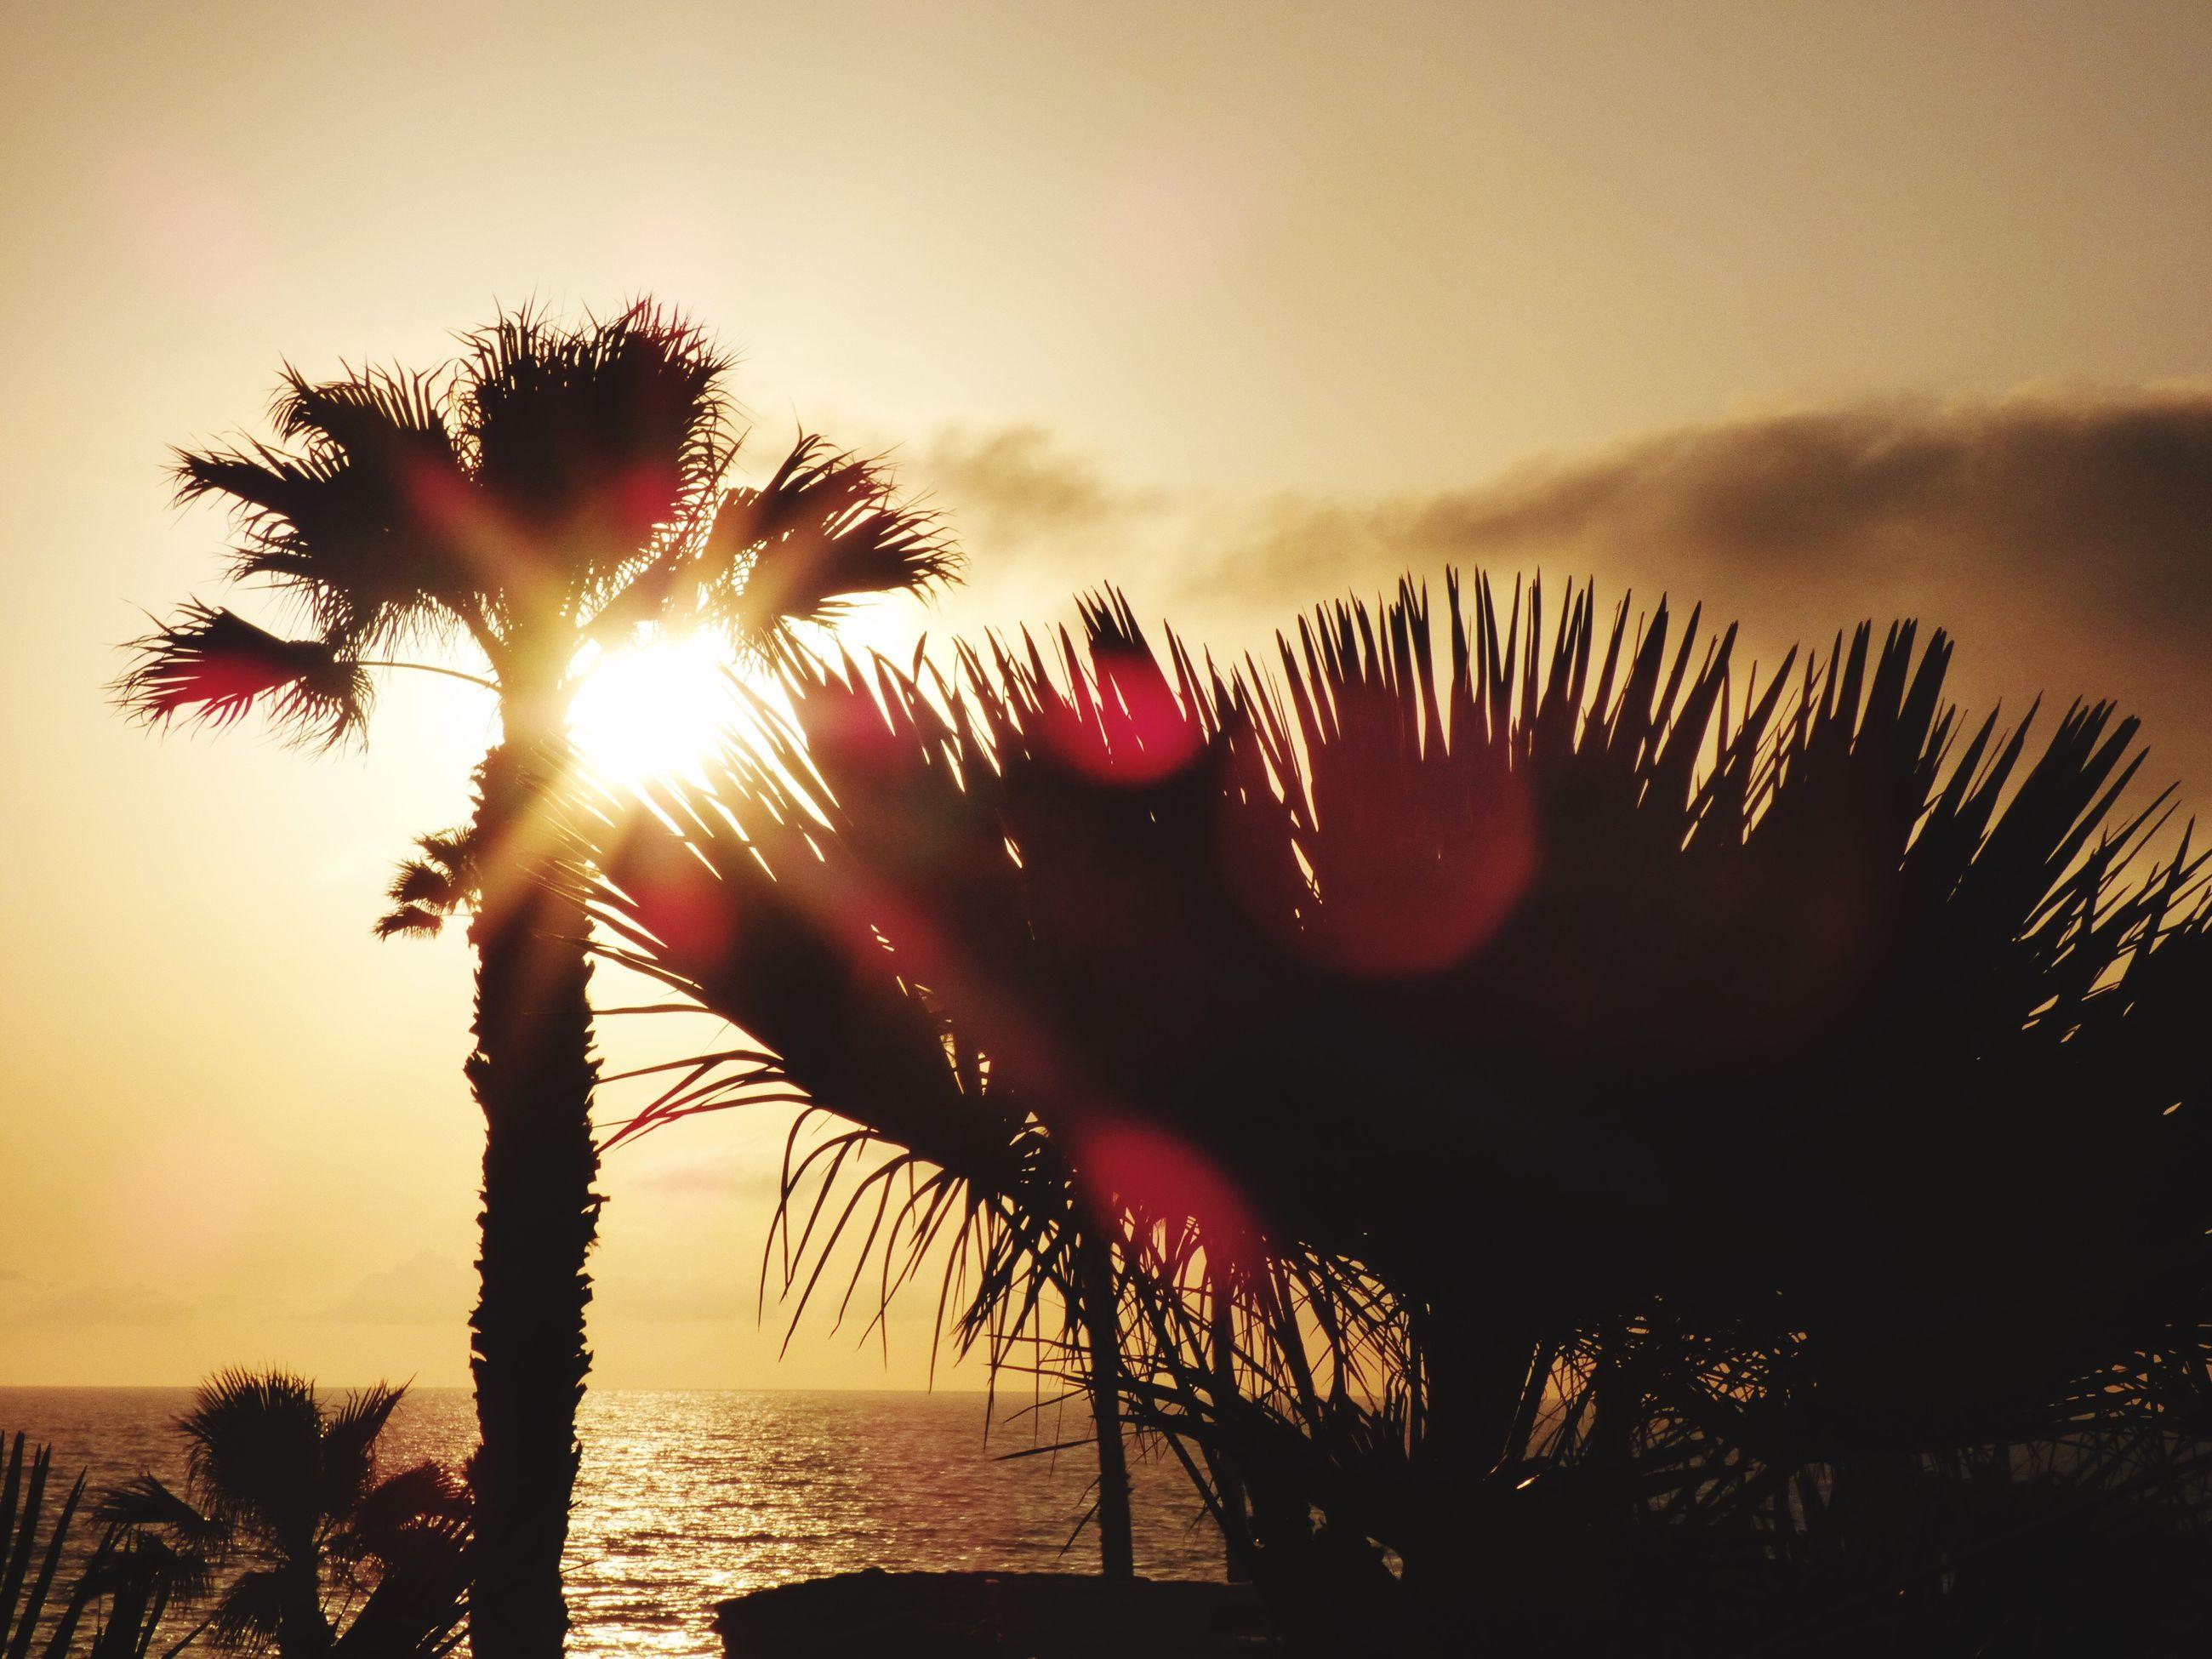 sunset, sun, silhouette, sunlight, nature, tree, scenics, outdoors, sky, sunbeam, beauty in nature, no people, day